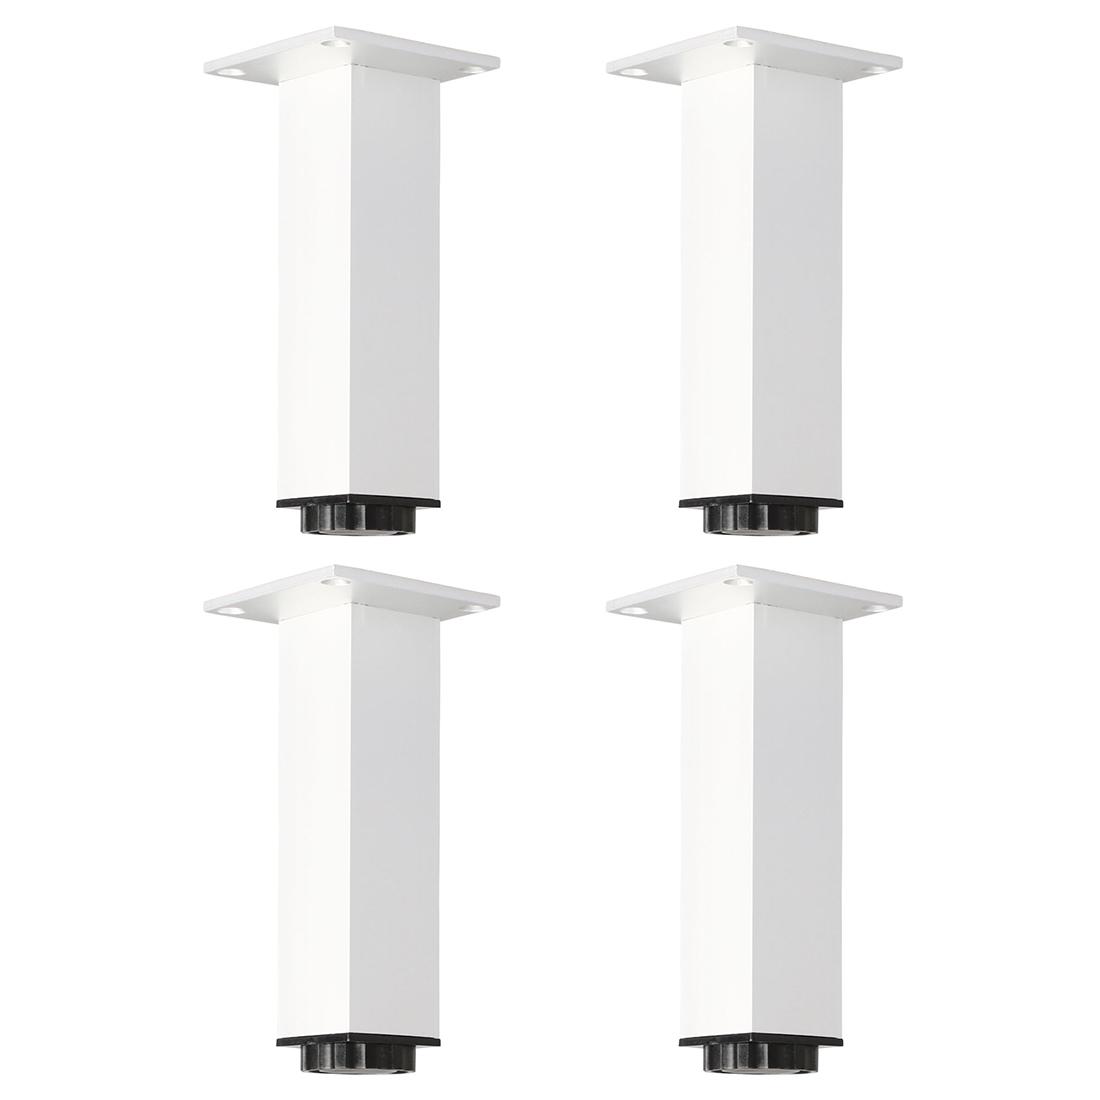 "6"" Furniture Leg Aluminium Alloy Sofa Feet Replacement Height Adjuster 4pcs"